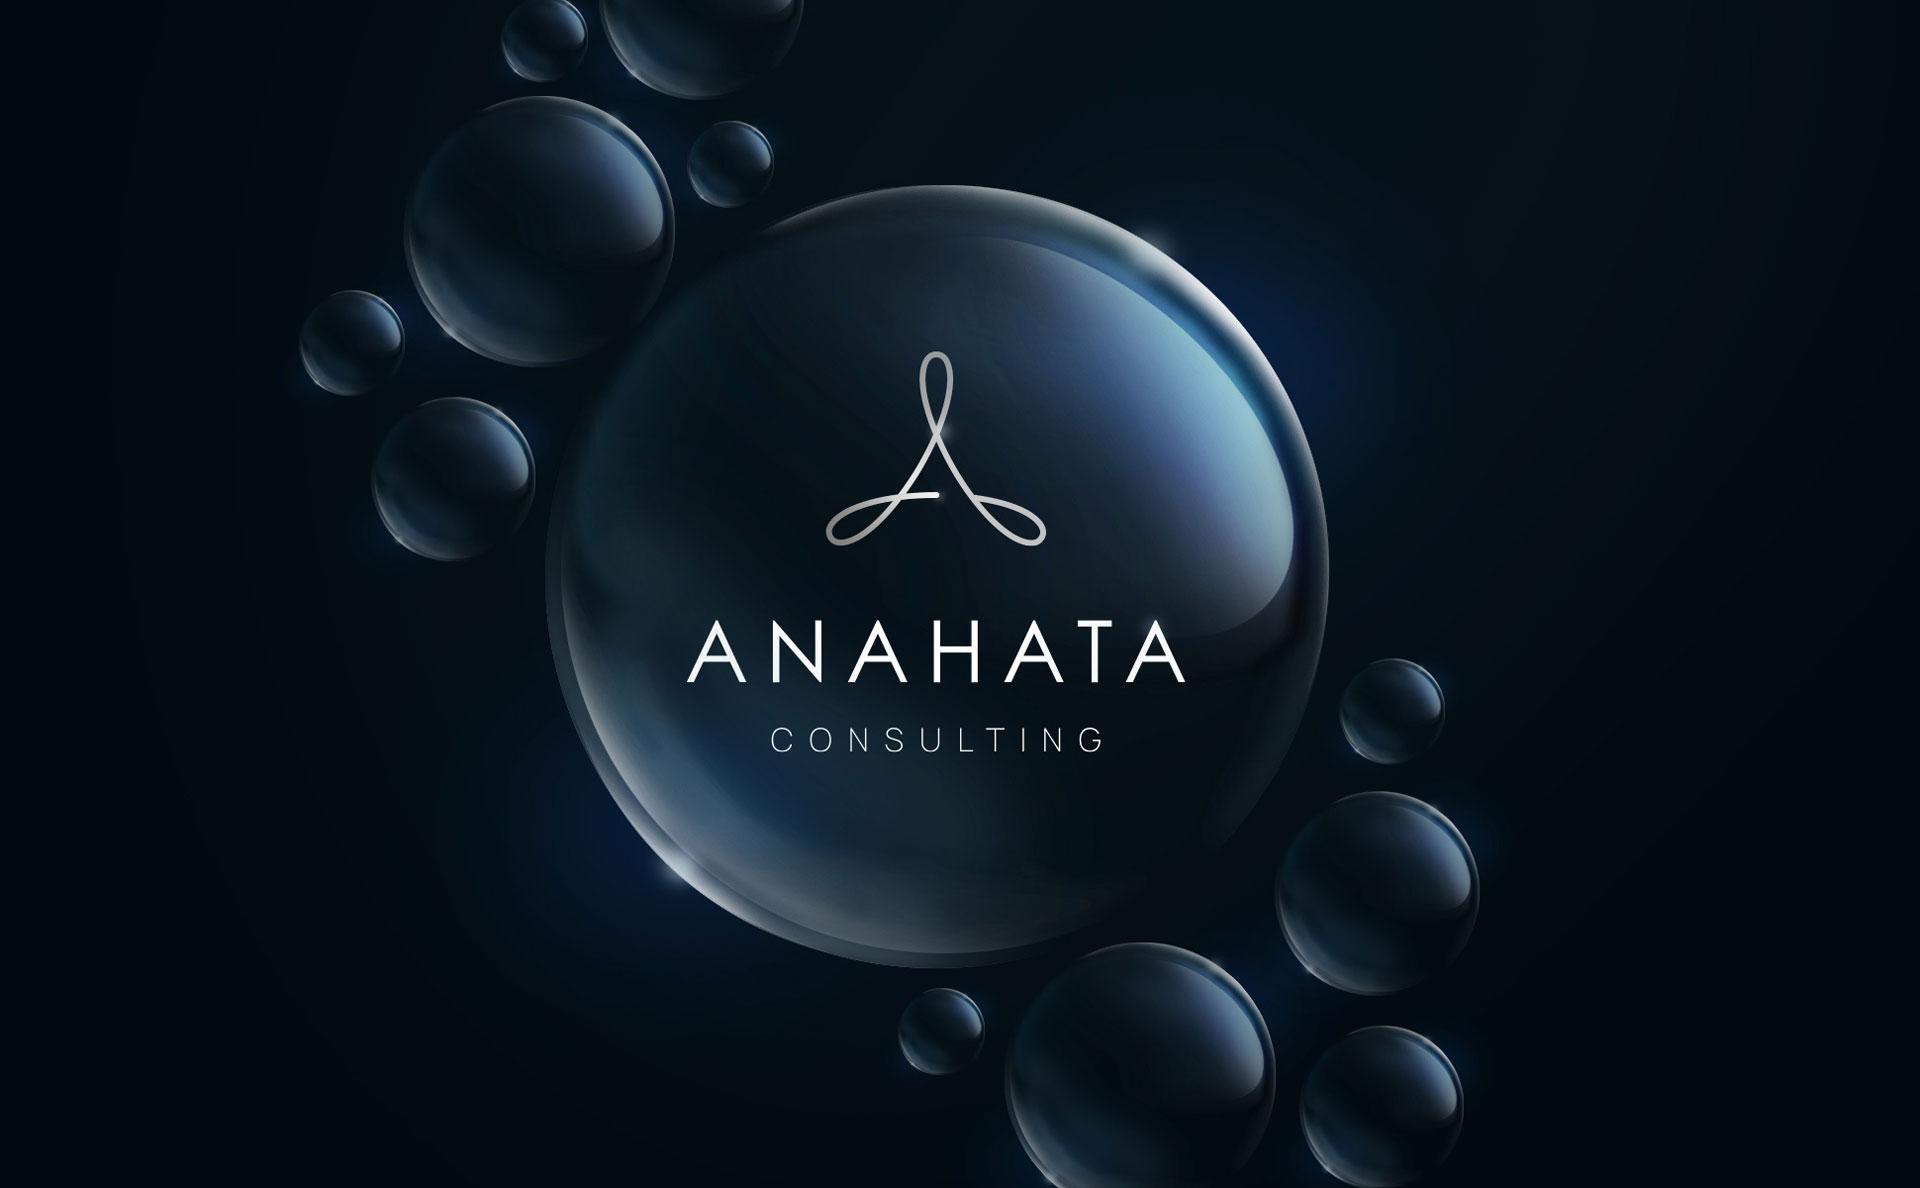 ANAHATA-projet-mockup-7.jpg